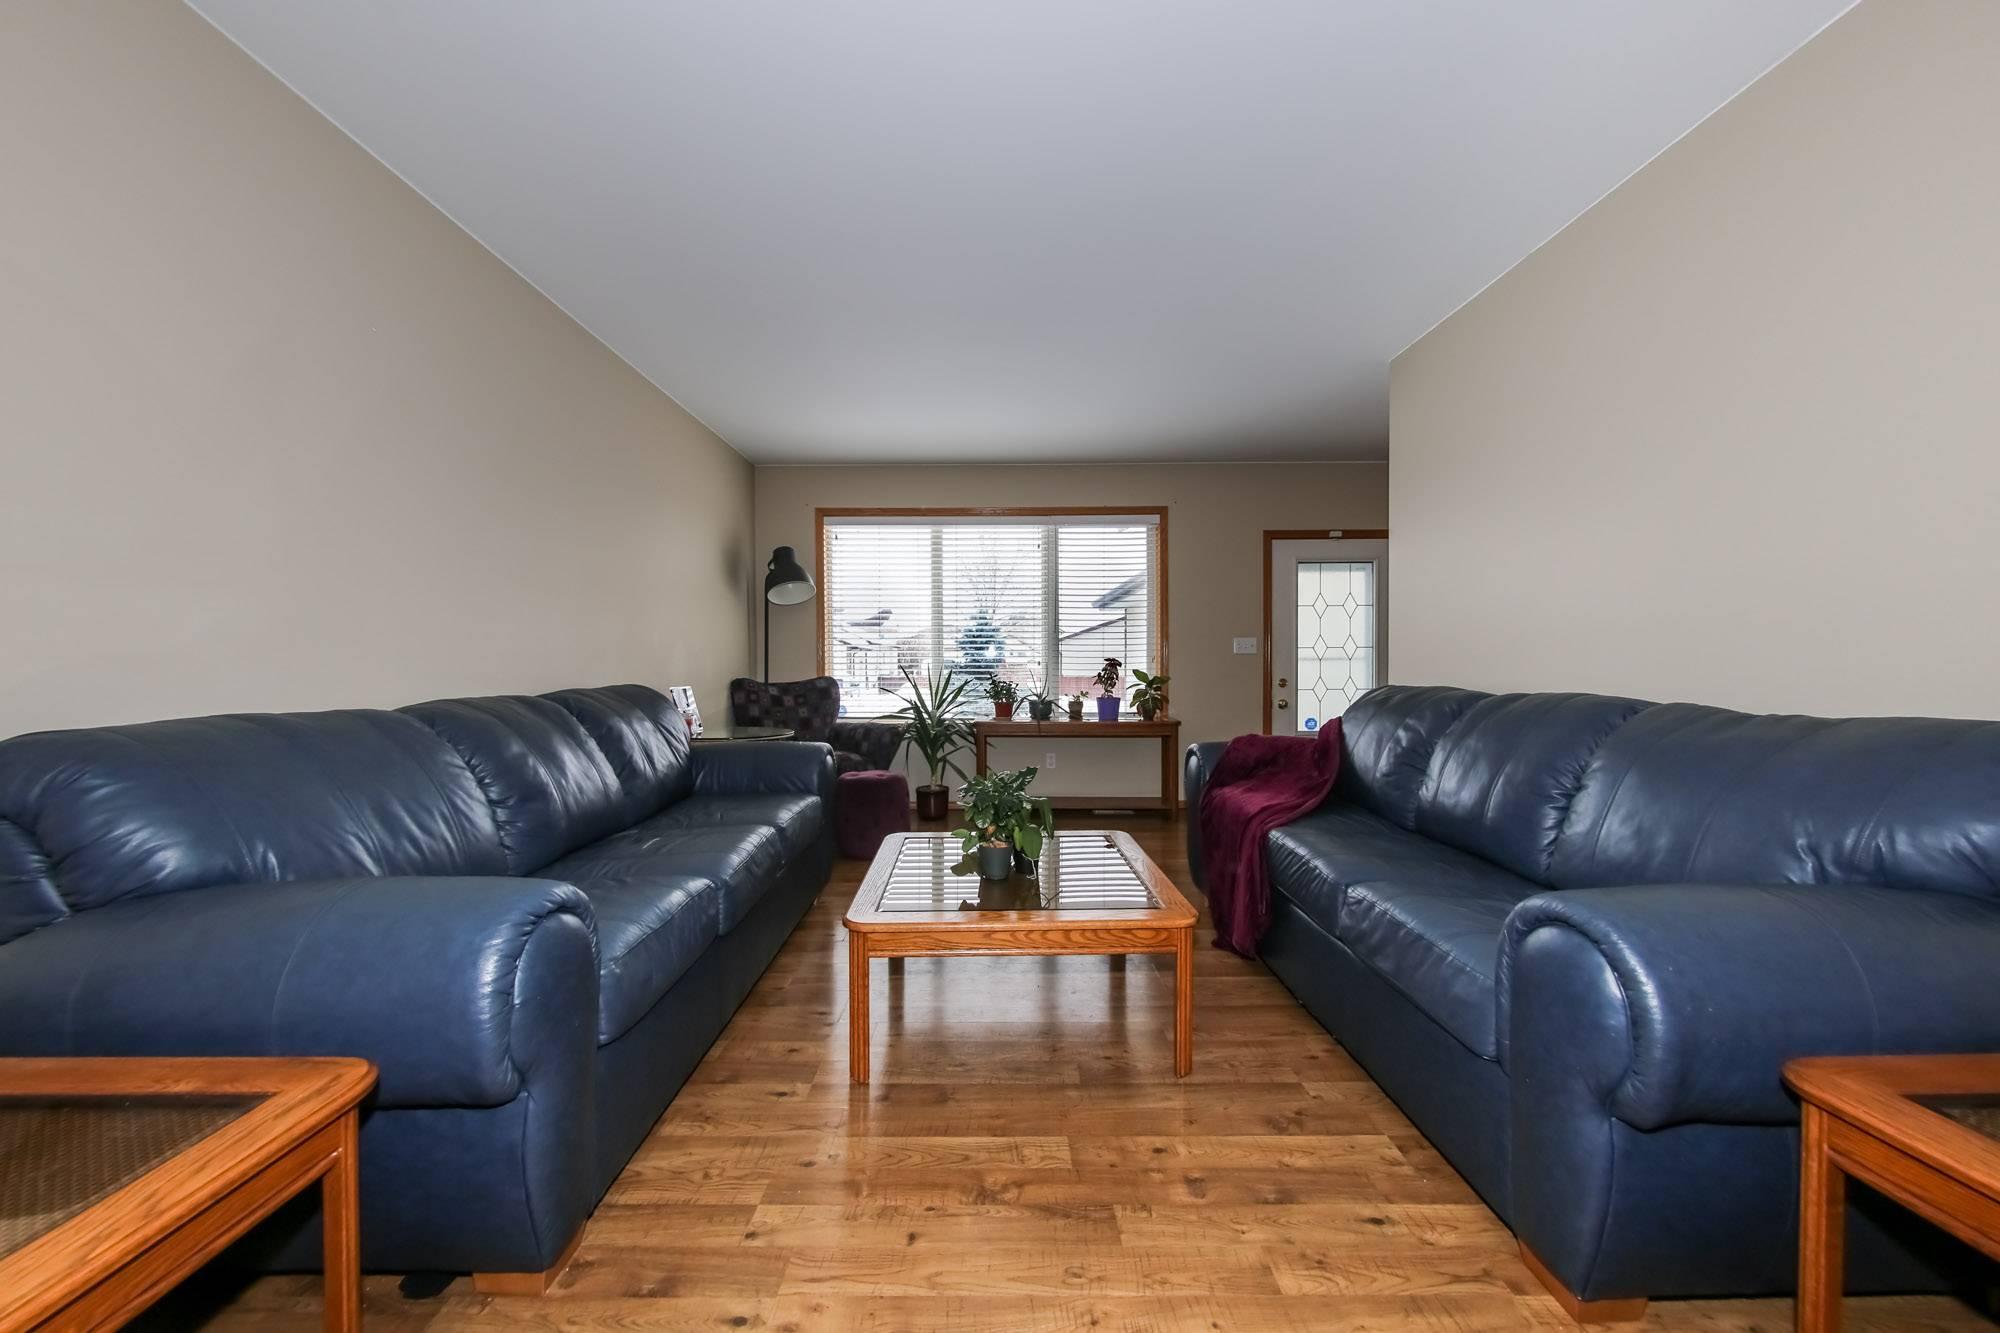 856 Kernaghan Avenue, Winnipeg, Manitoba  R2C 4Z5 - Photo 3 - 1905124